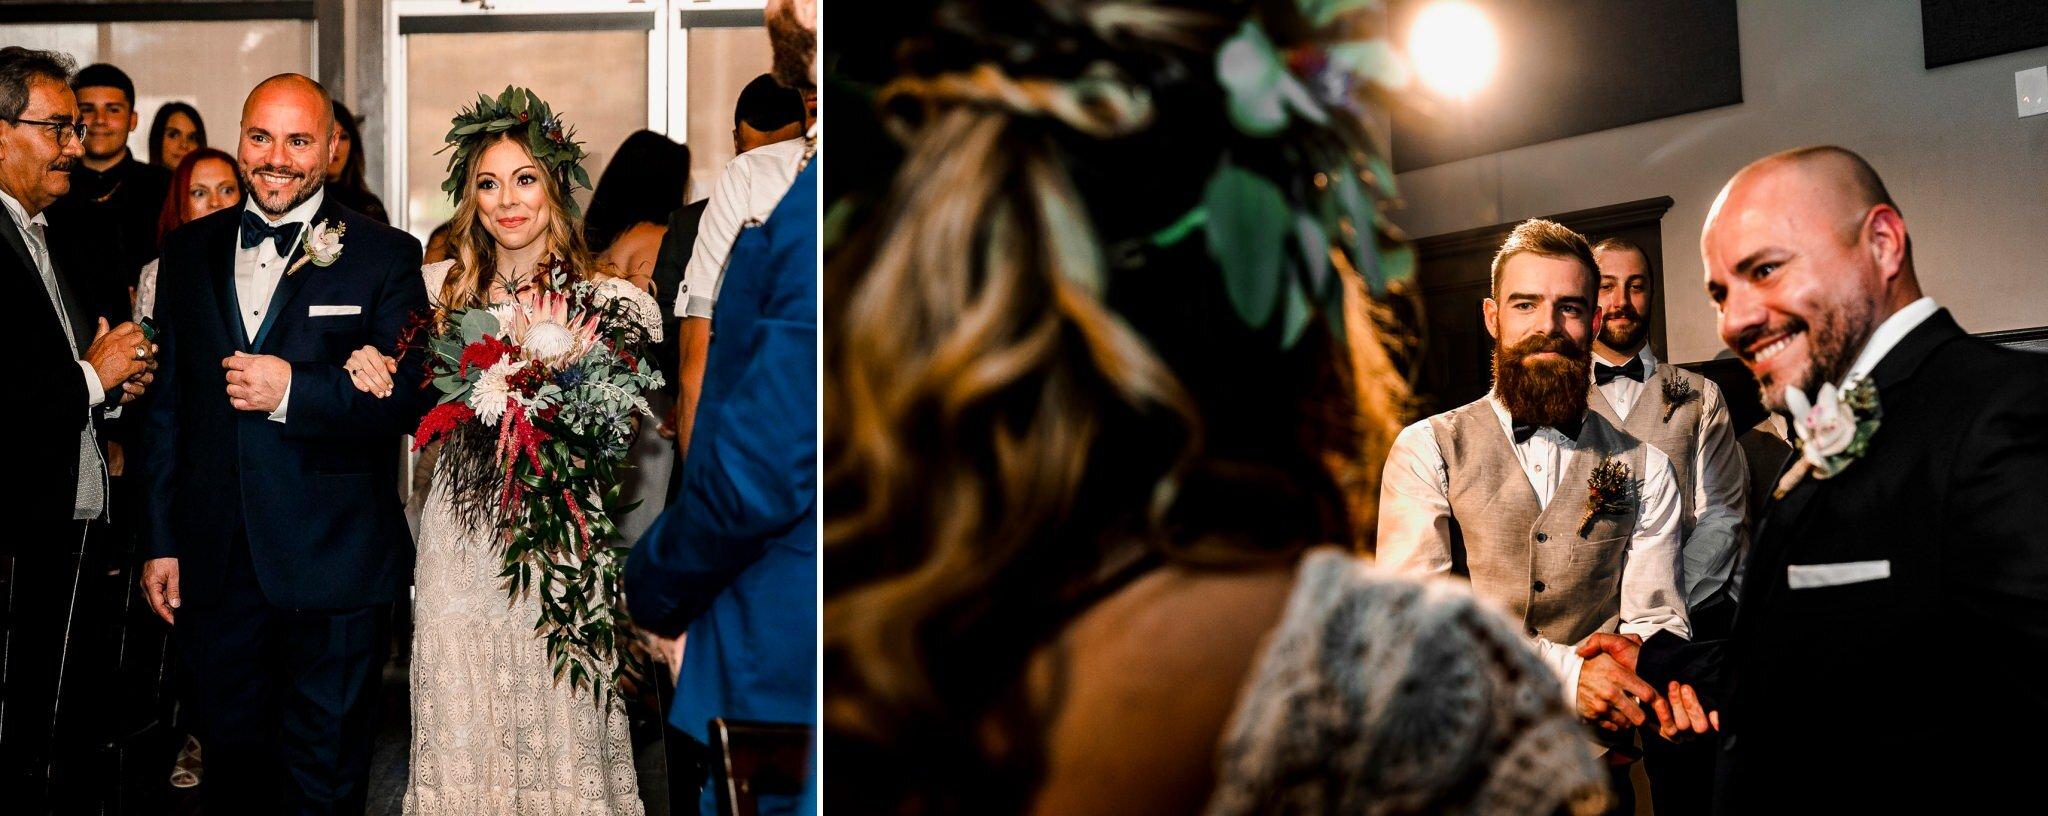 Hoffman-618-New-Jersey-Wedding-Photographer-61.JPG